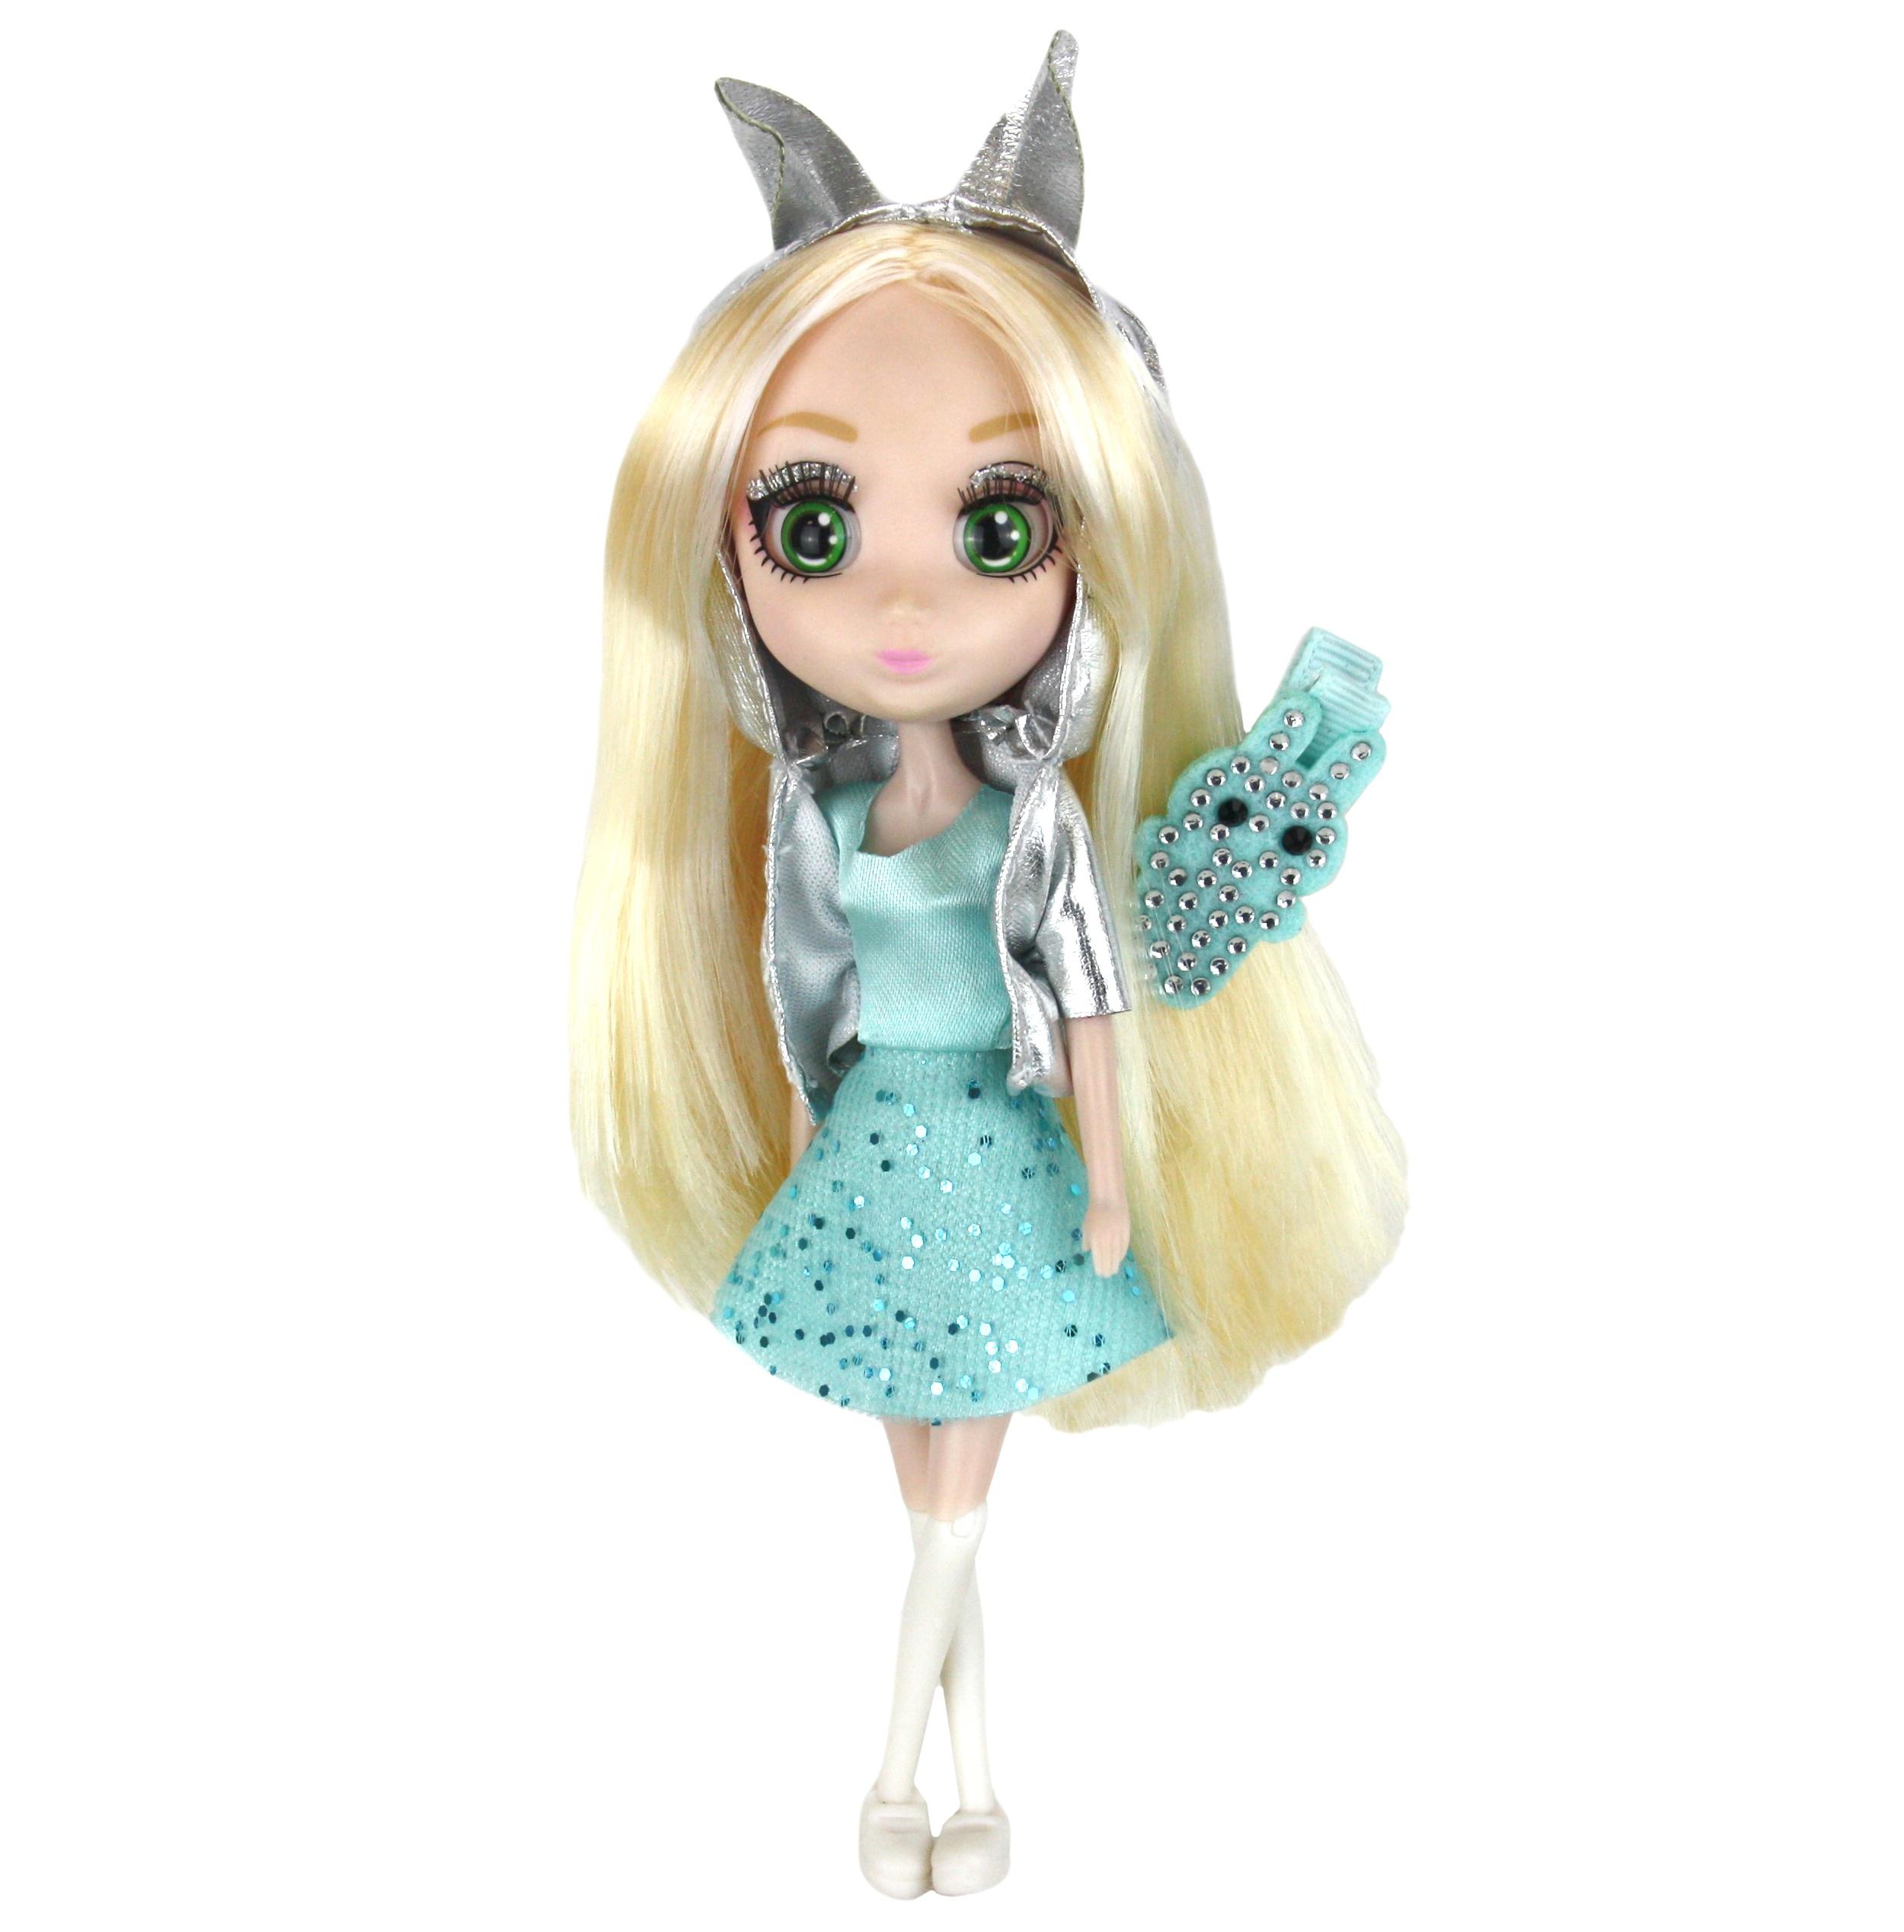 Кукла Shibajuku Girls – Кое, 15 смШибаджуку Shibajuku Girls<br>Кукла Shibajuku Girls – Кое, 15 см<br>